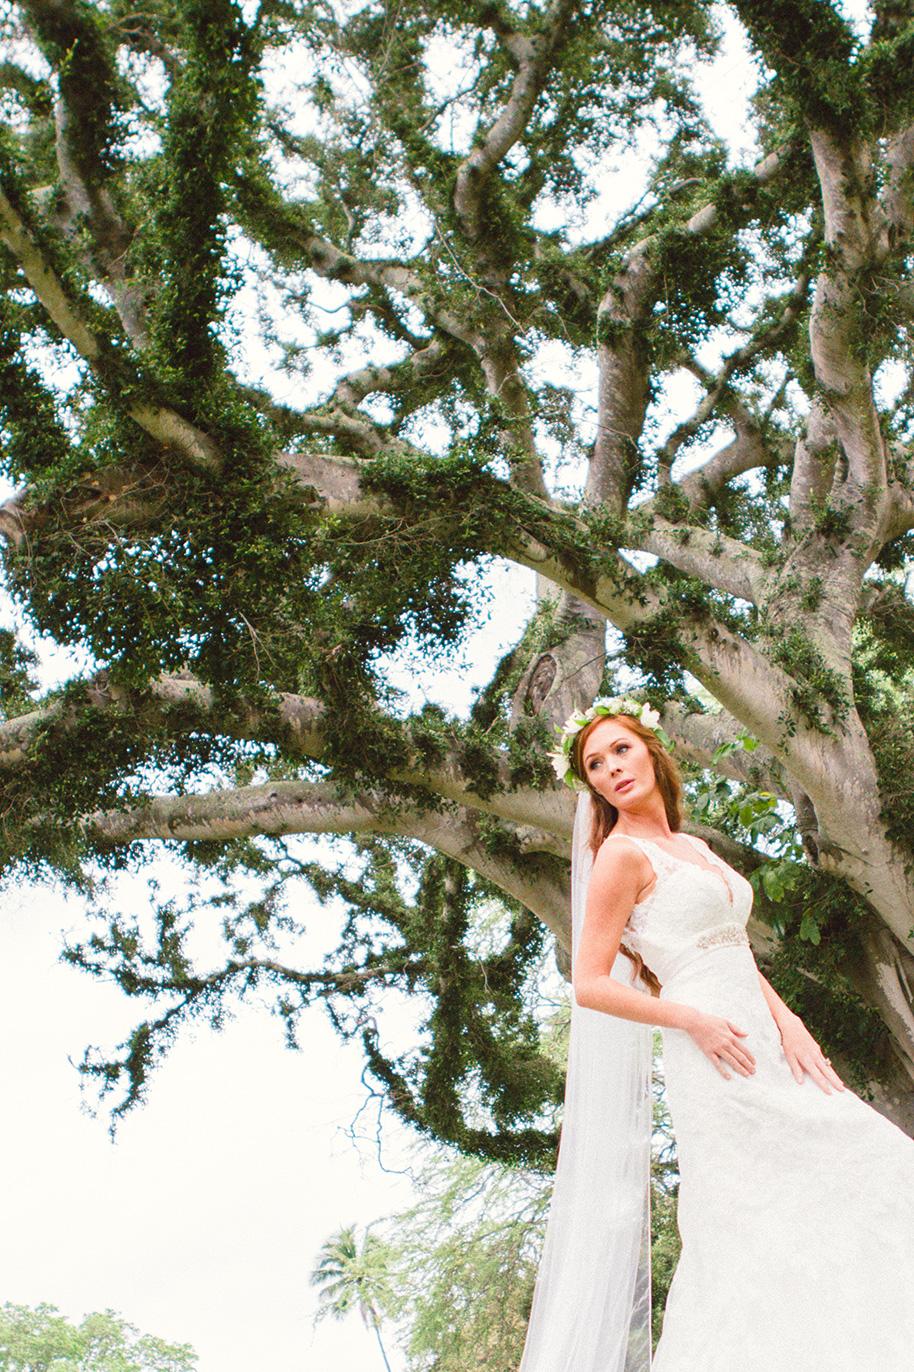 Dillingham-Ranch-Wedding-040516-4